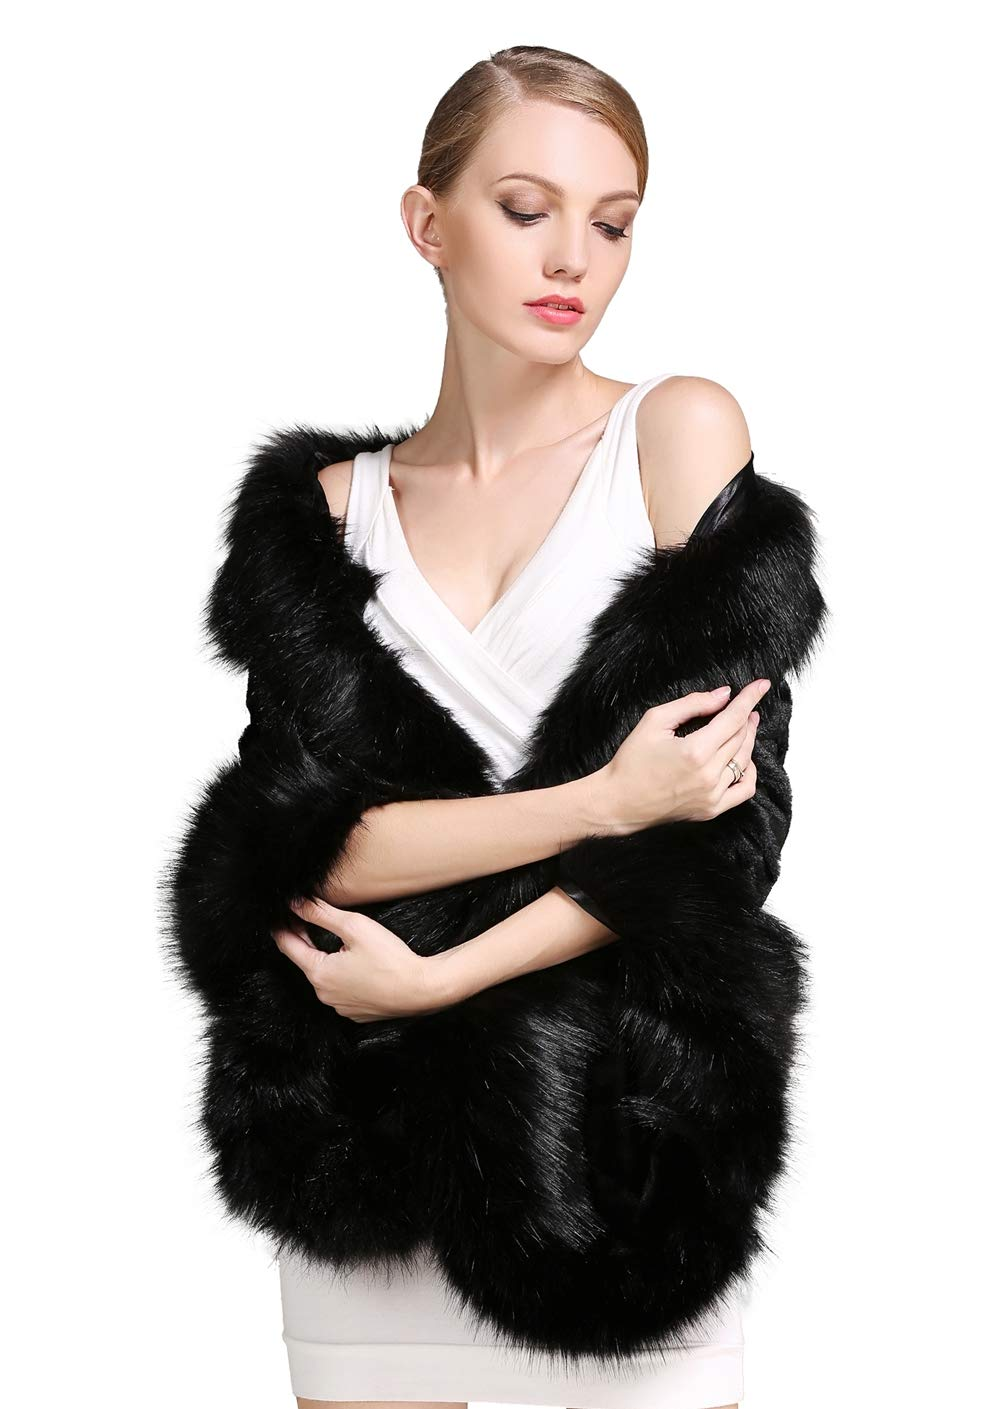 BEAUTELICATE Estola Chal Pelo Mujer Boleros Marfil Negro para Fiesta Bodas Novia Invierno Vestido de Noche